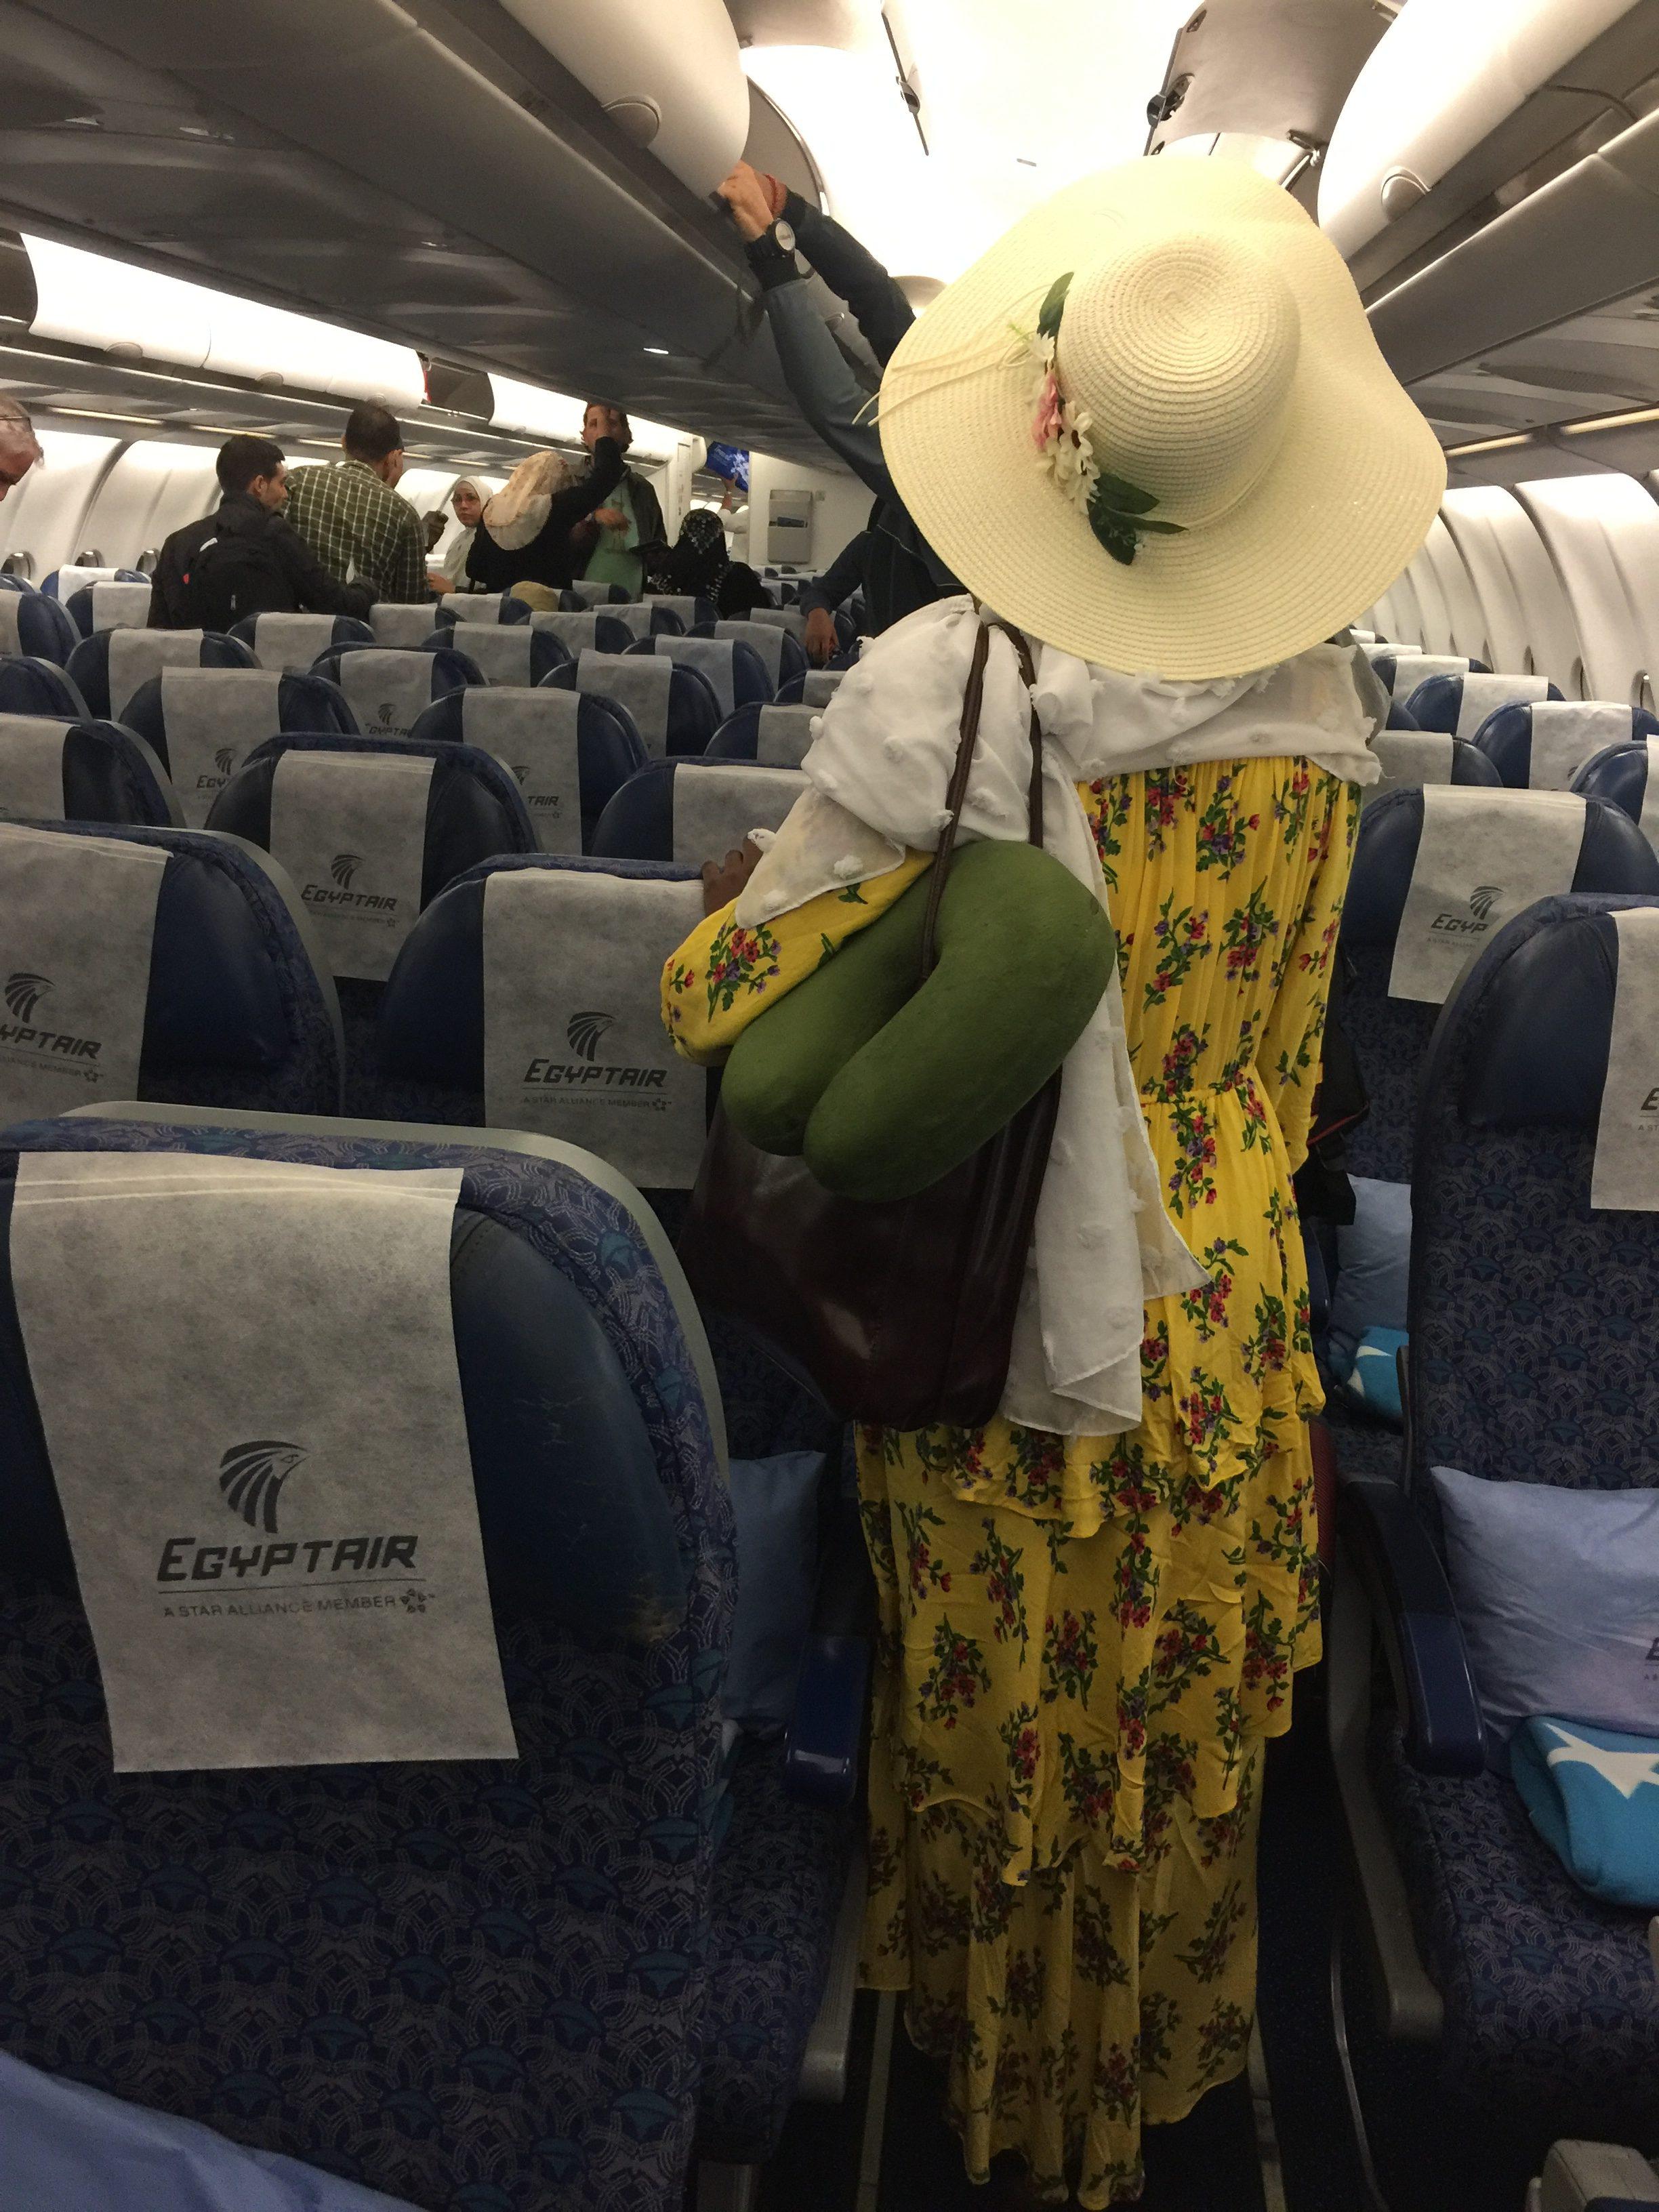 Egyptair Customer Reviews | SKYTRAX